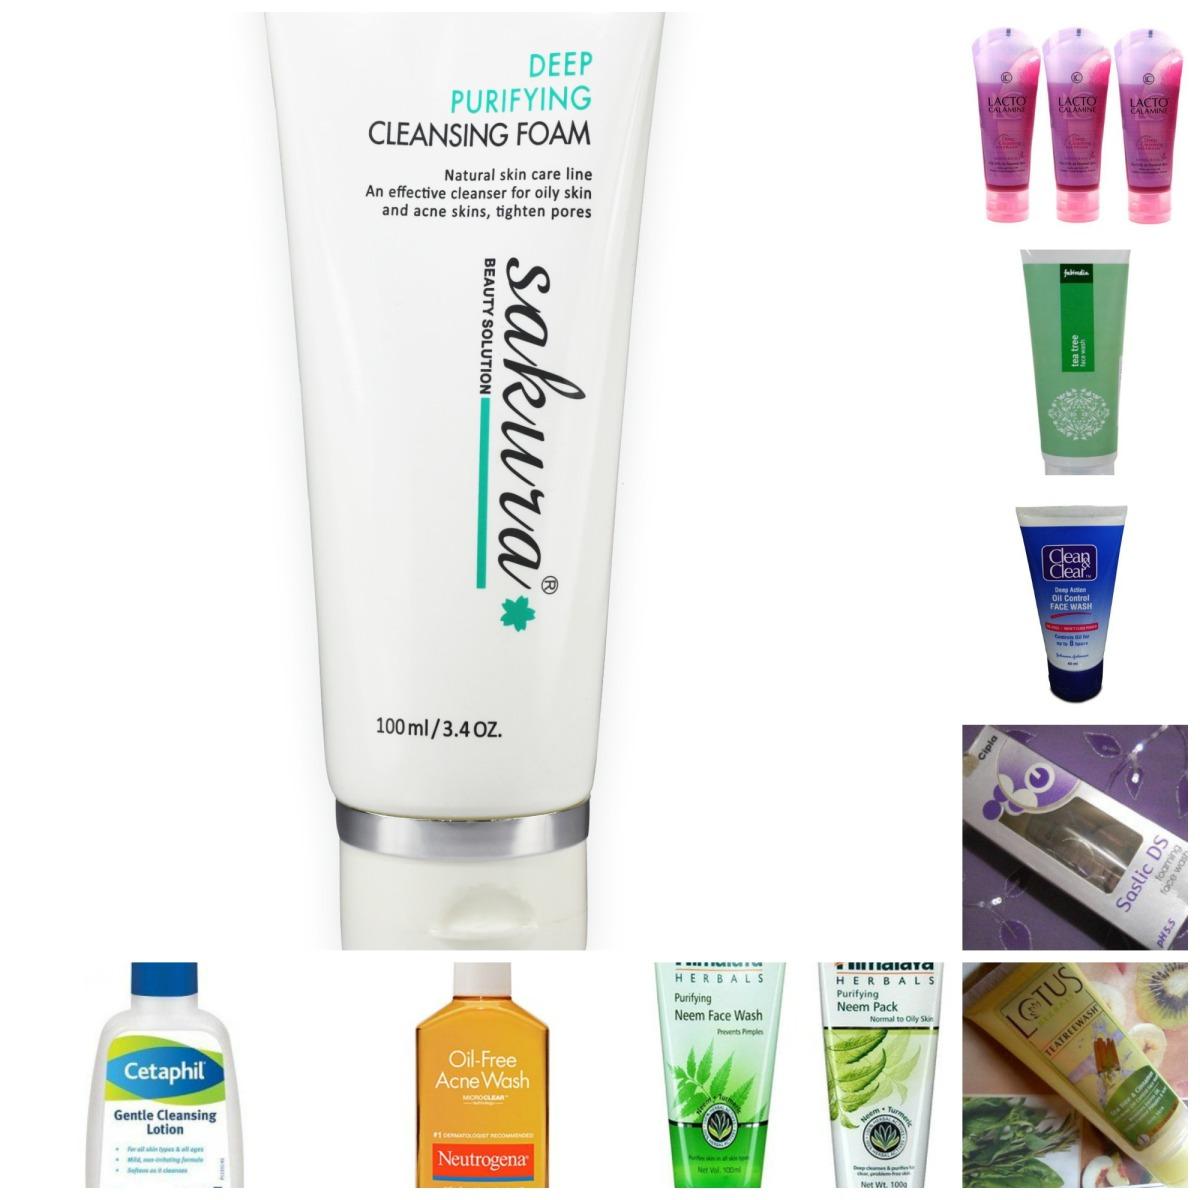 Top 10 loại sữa rửa mặt cho da dầu nhờn